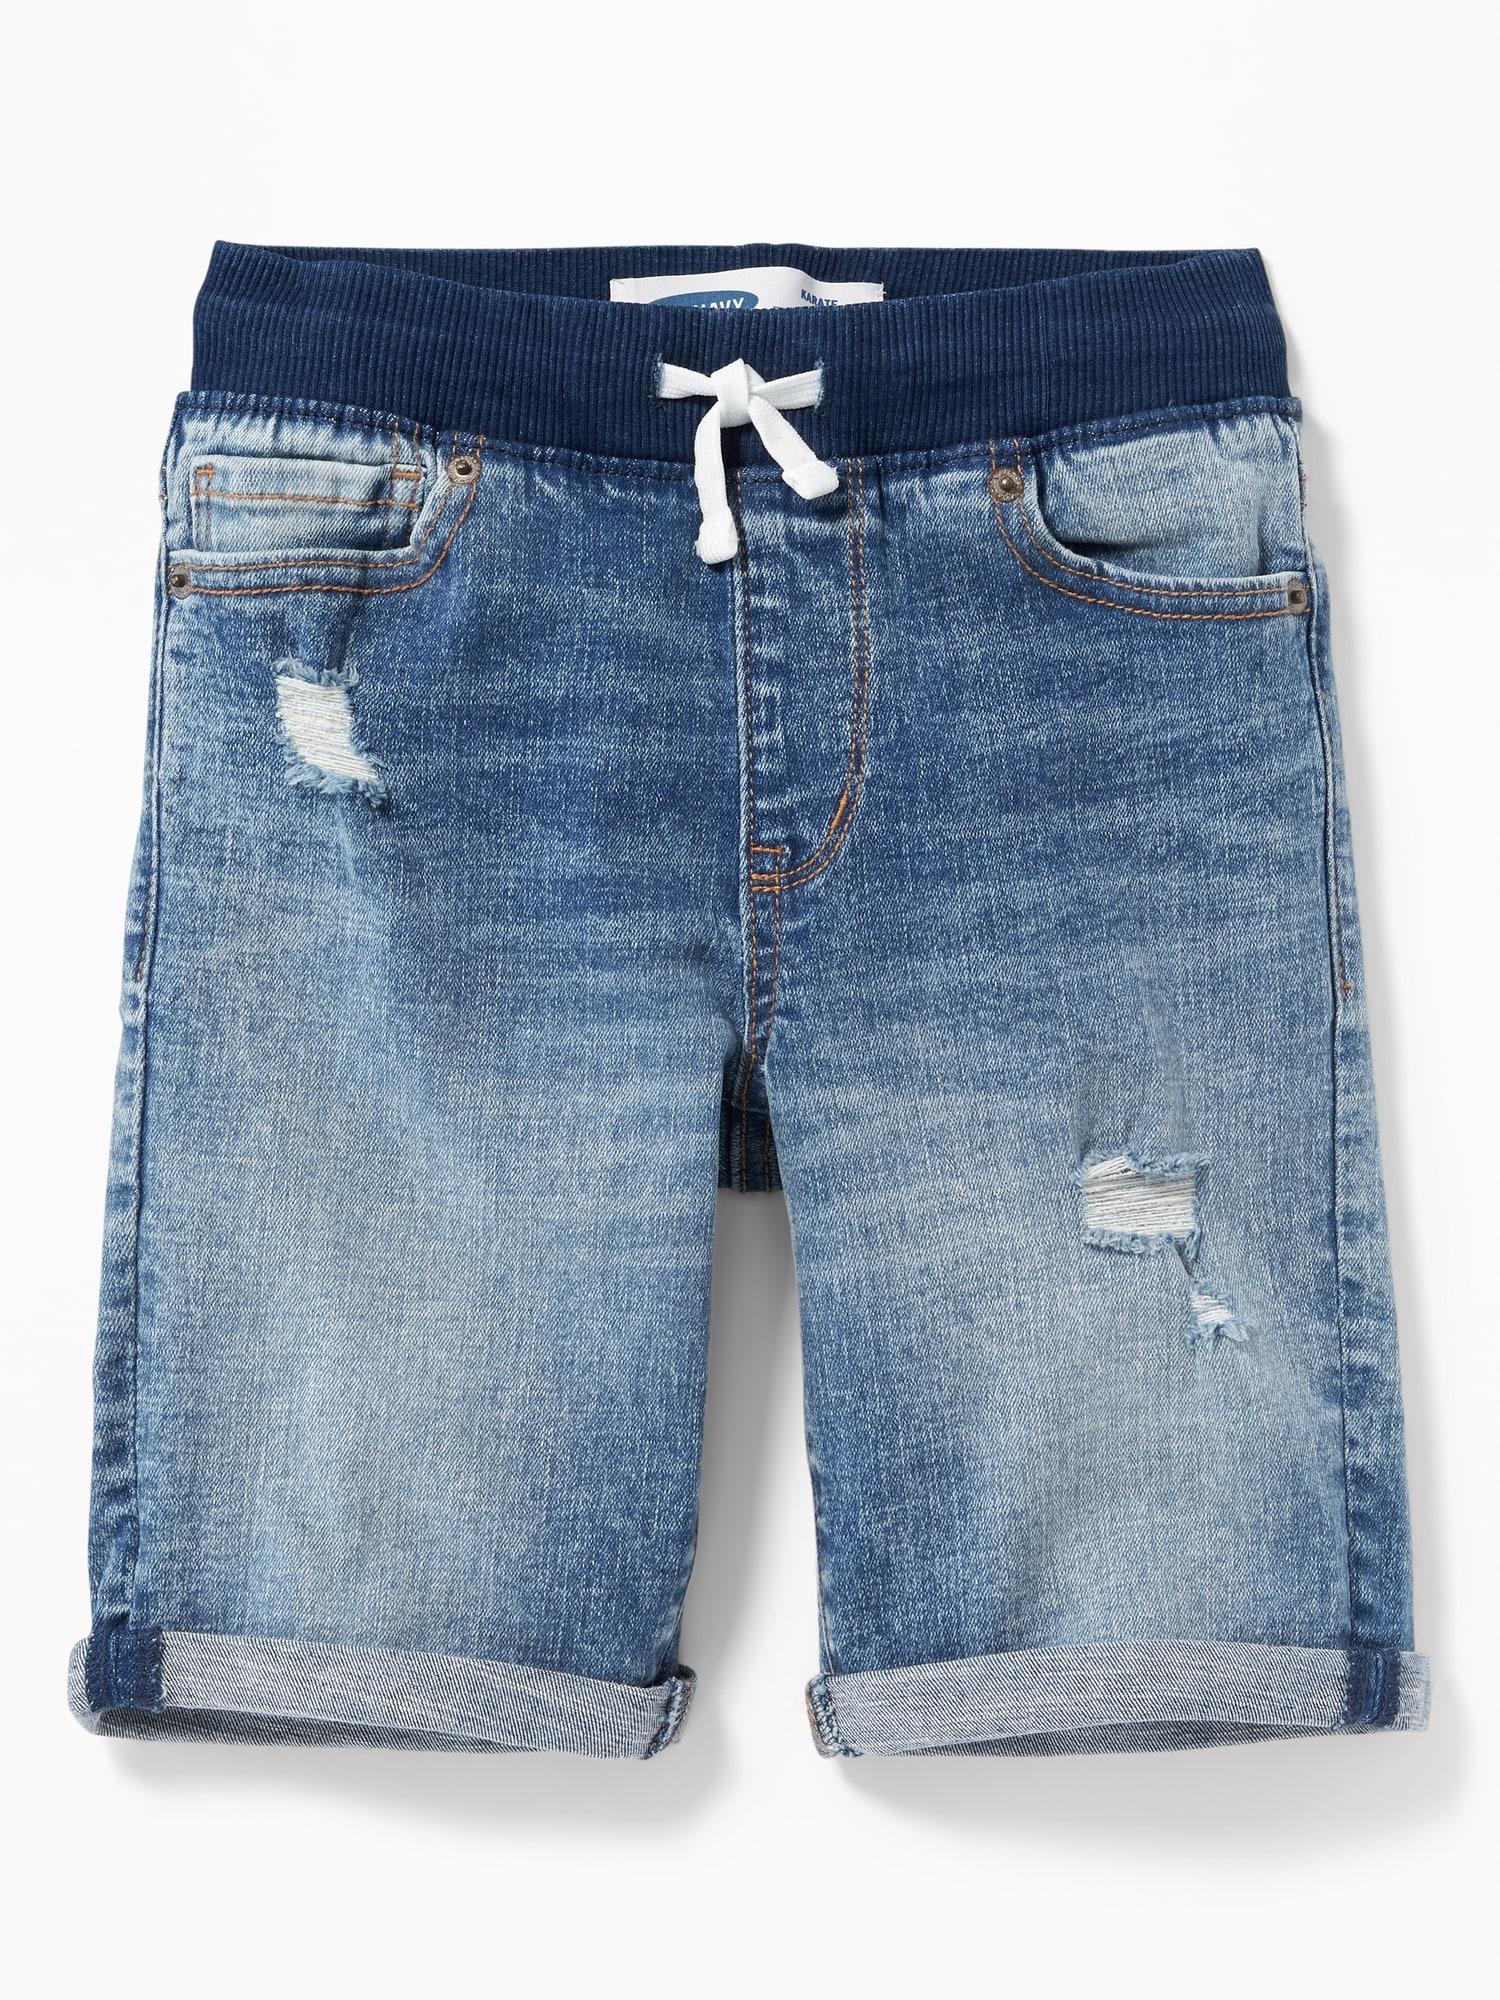 dc630796294 Karate Rib-Knit Waist Distressed Denim Shorts for Boys